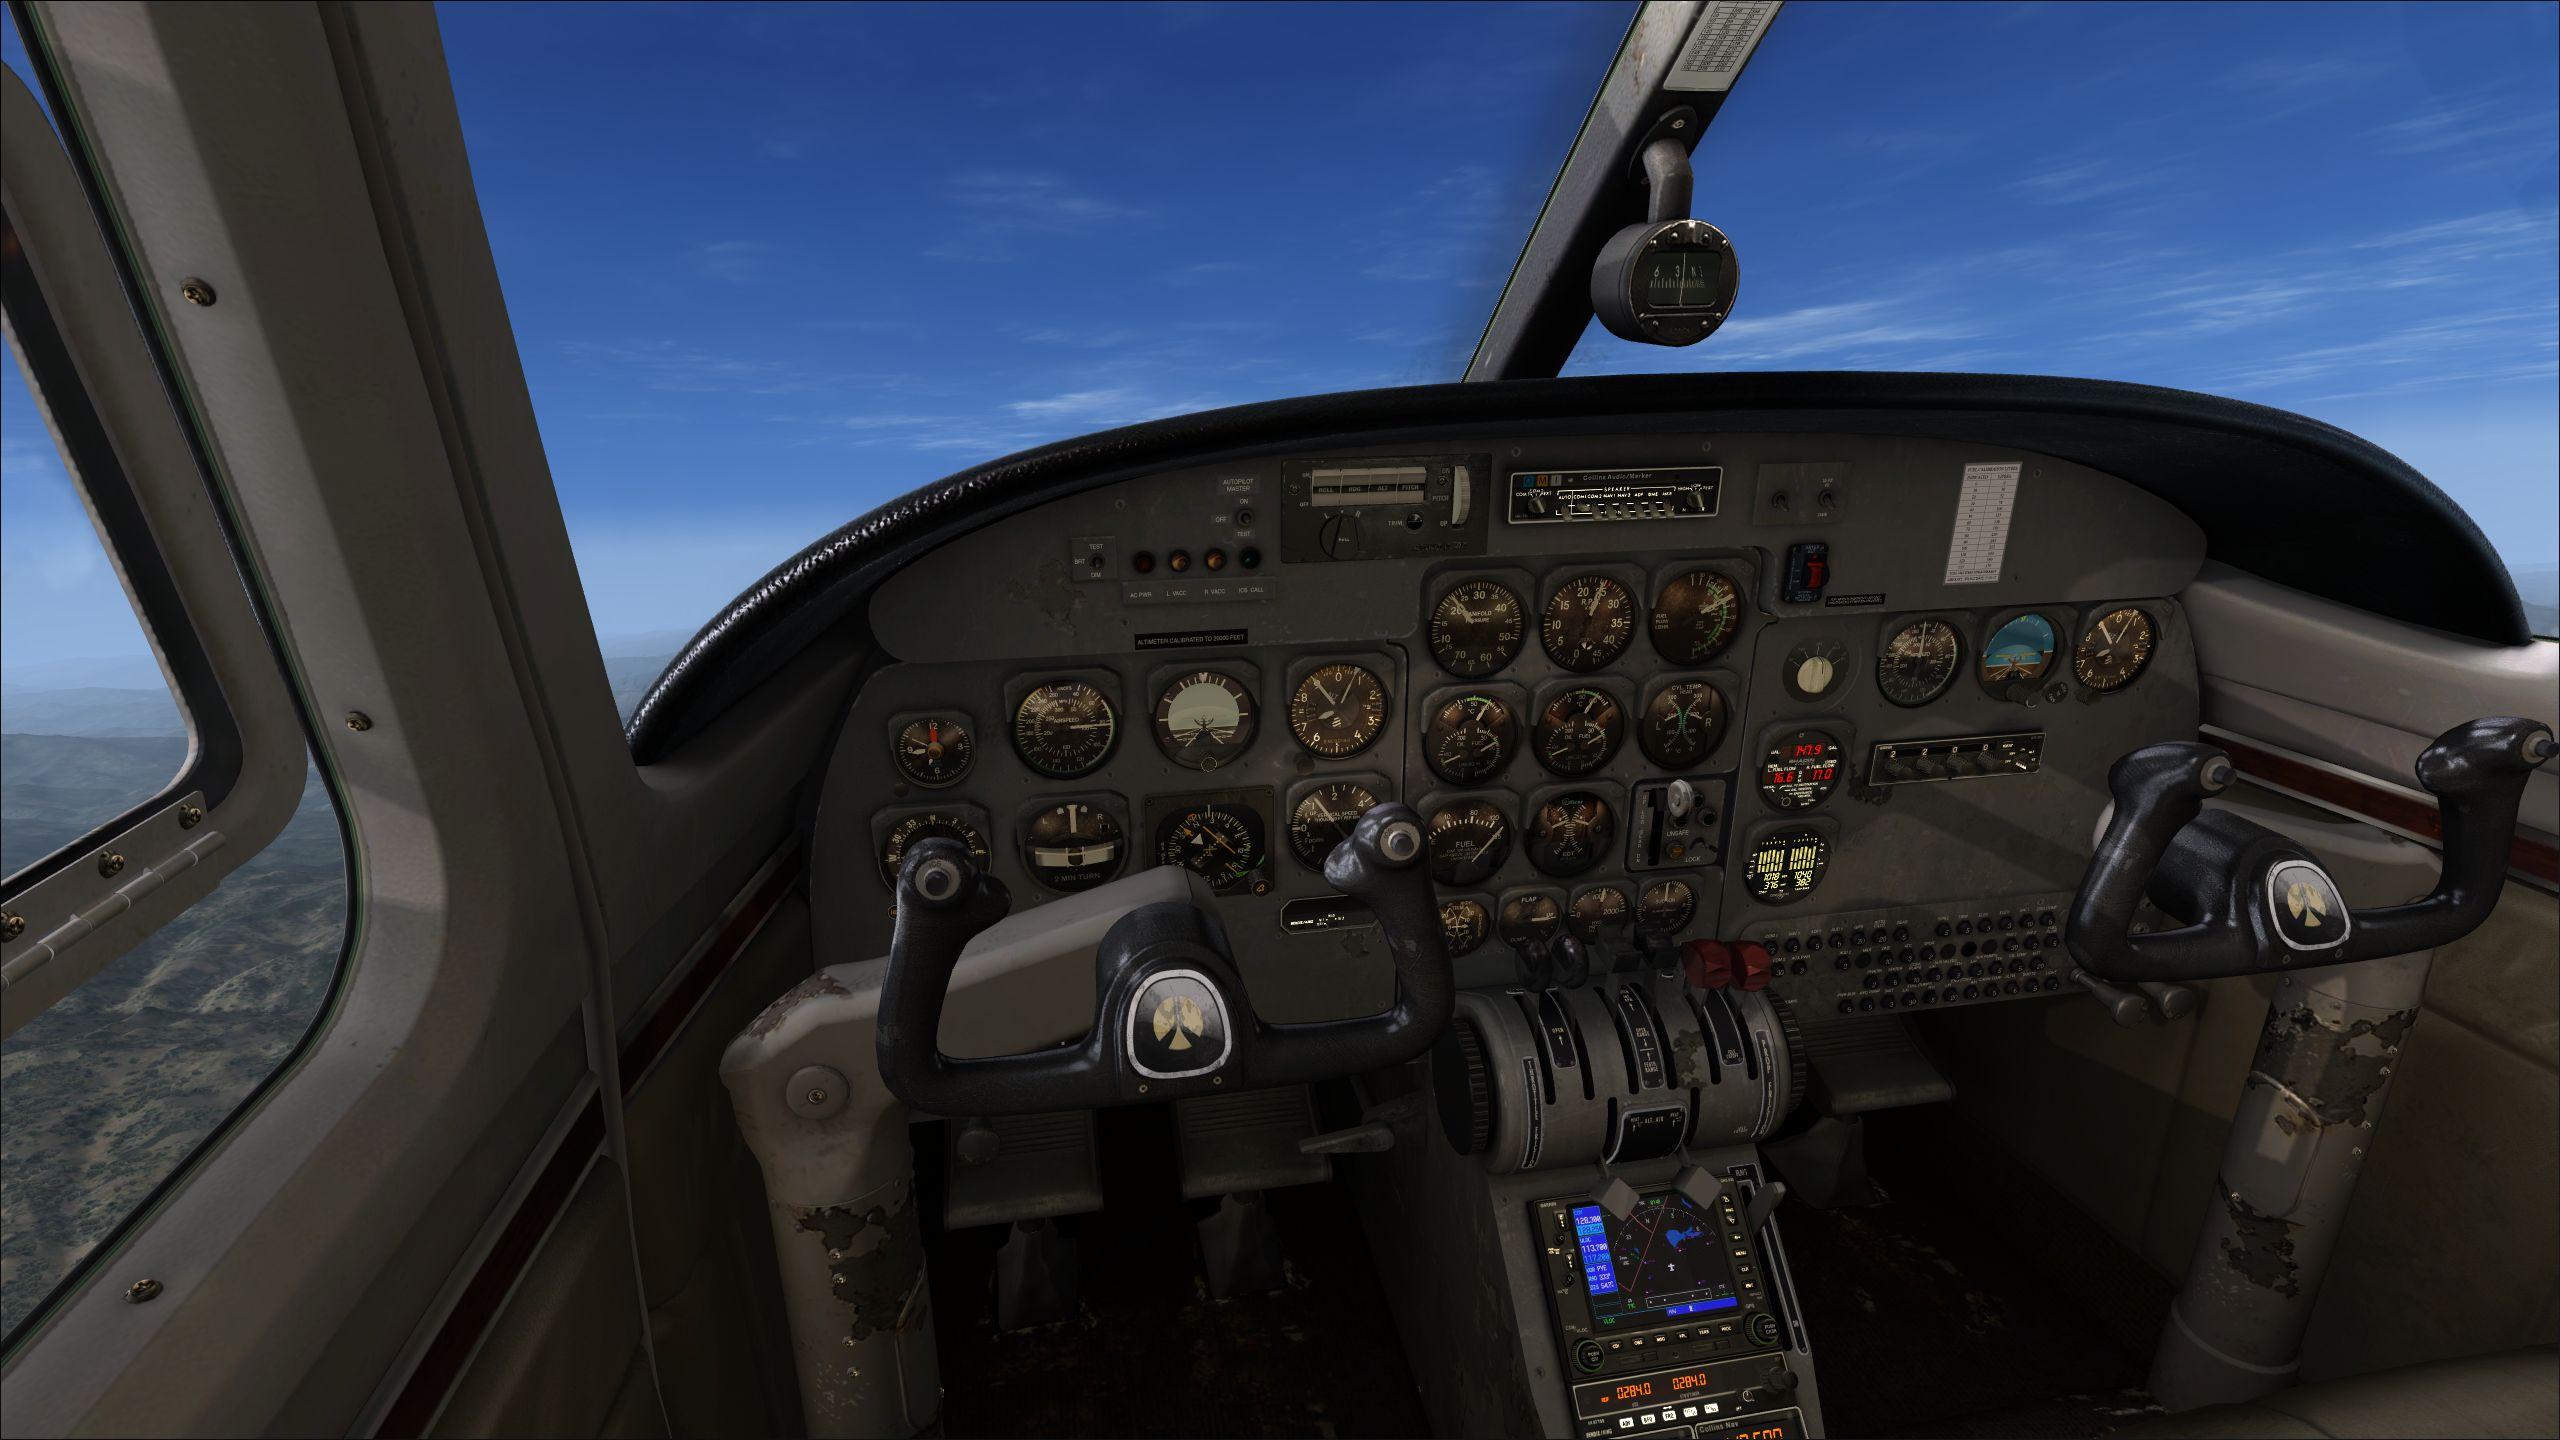 Carenado 500s shrike aero commander released!!! [Archive